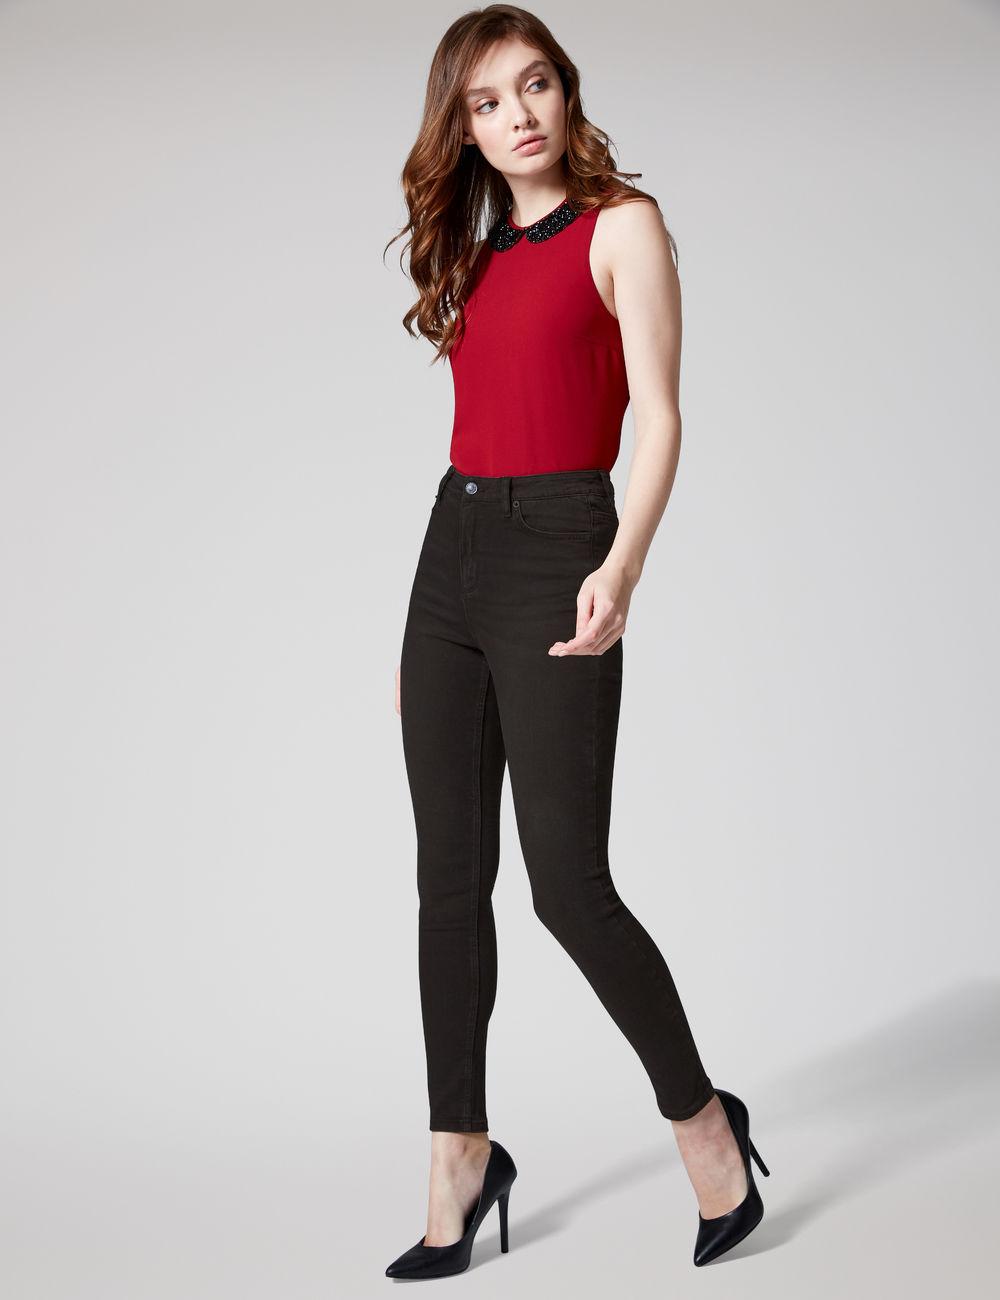 jean super skinny taille haute noir Jennyfer prix 19,99 €